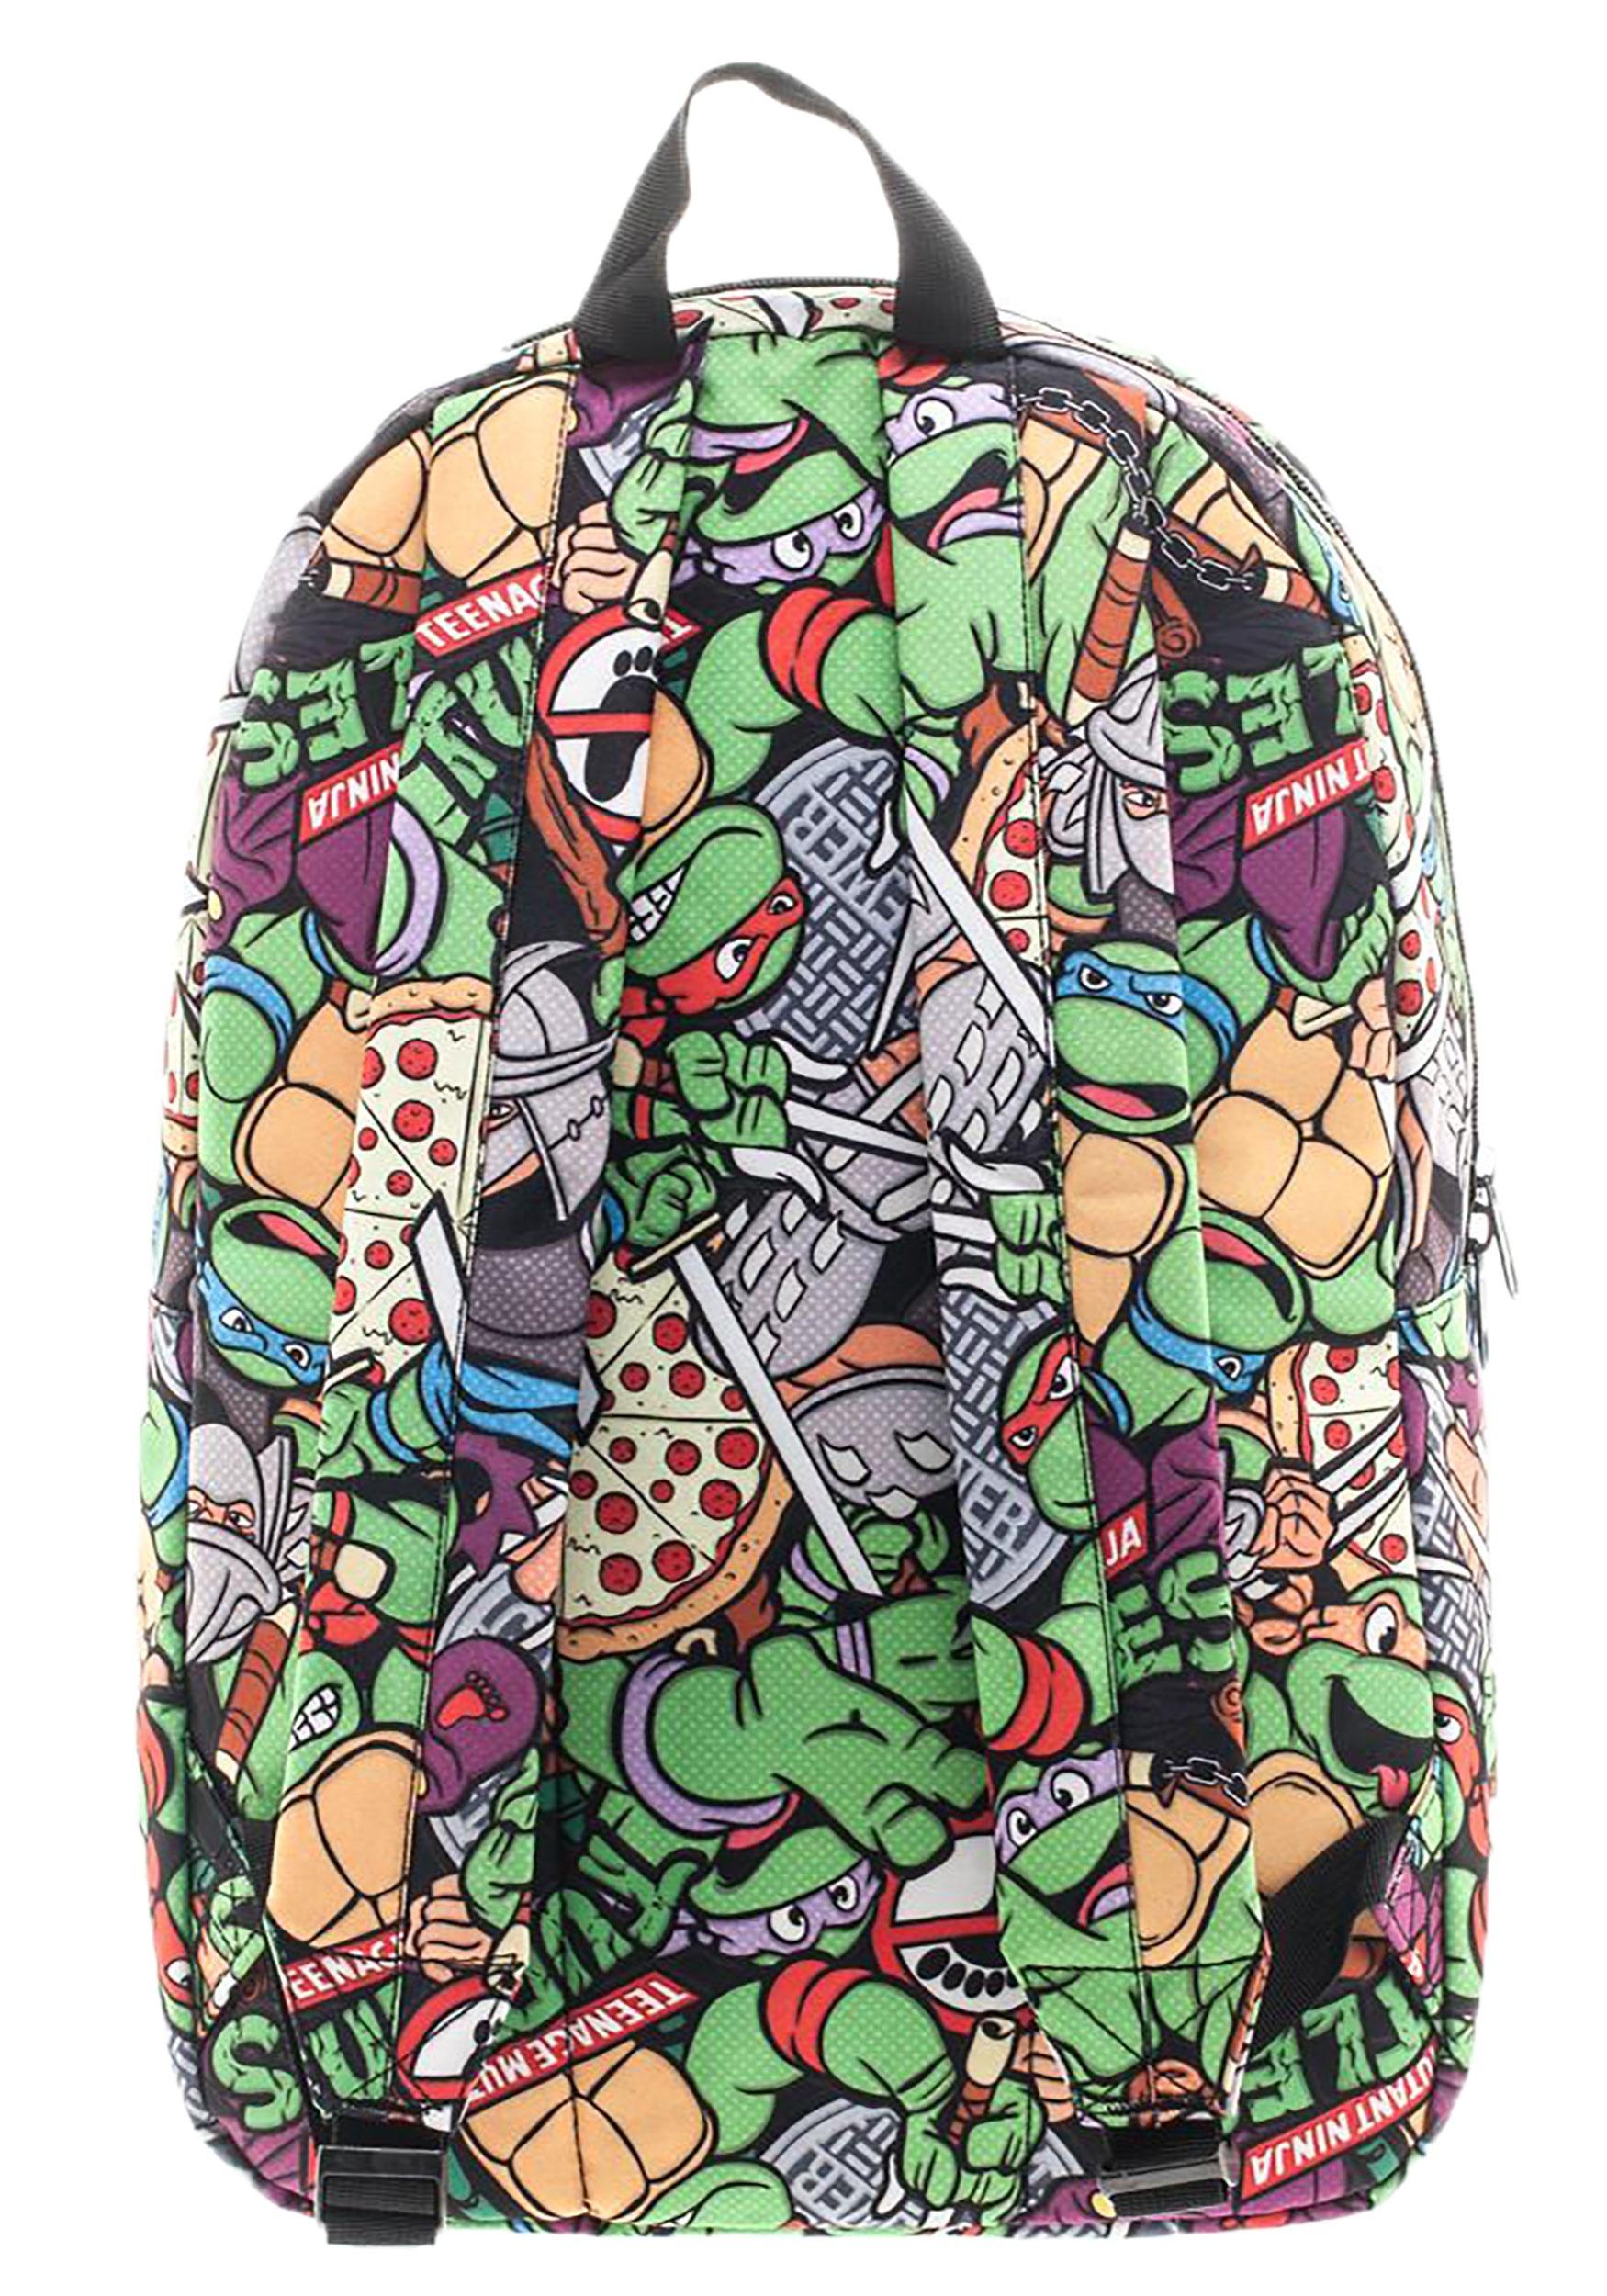 Teenage Mutant Ninja Turtles Backpack For Kids